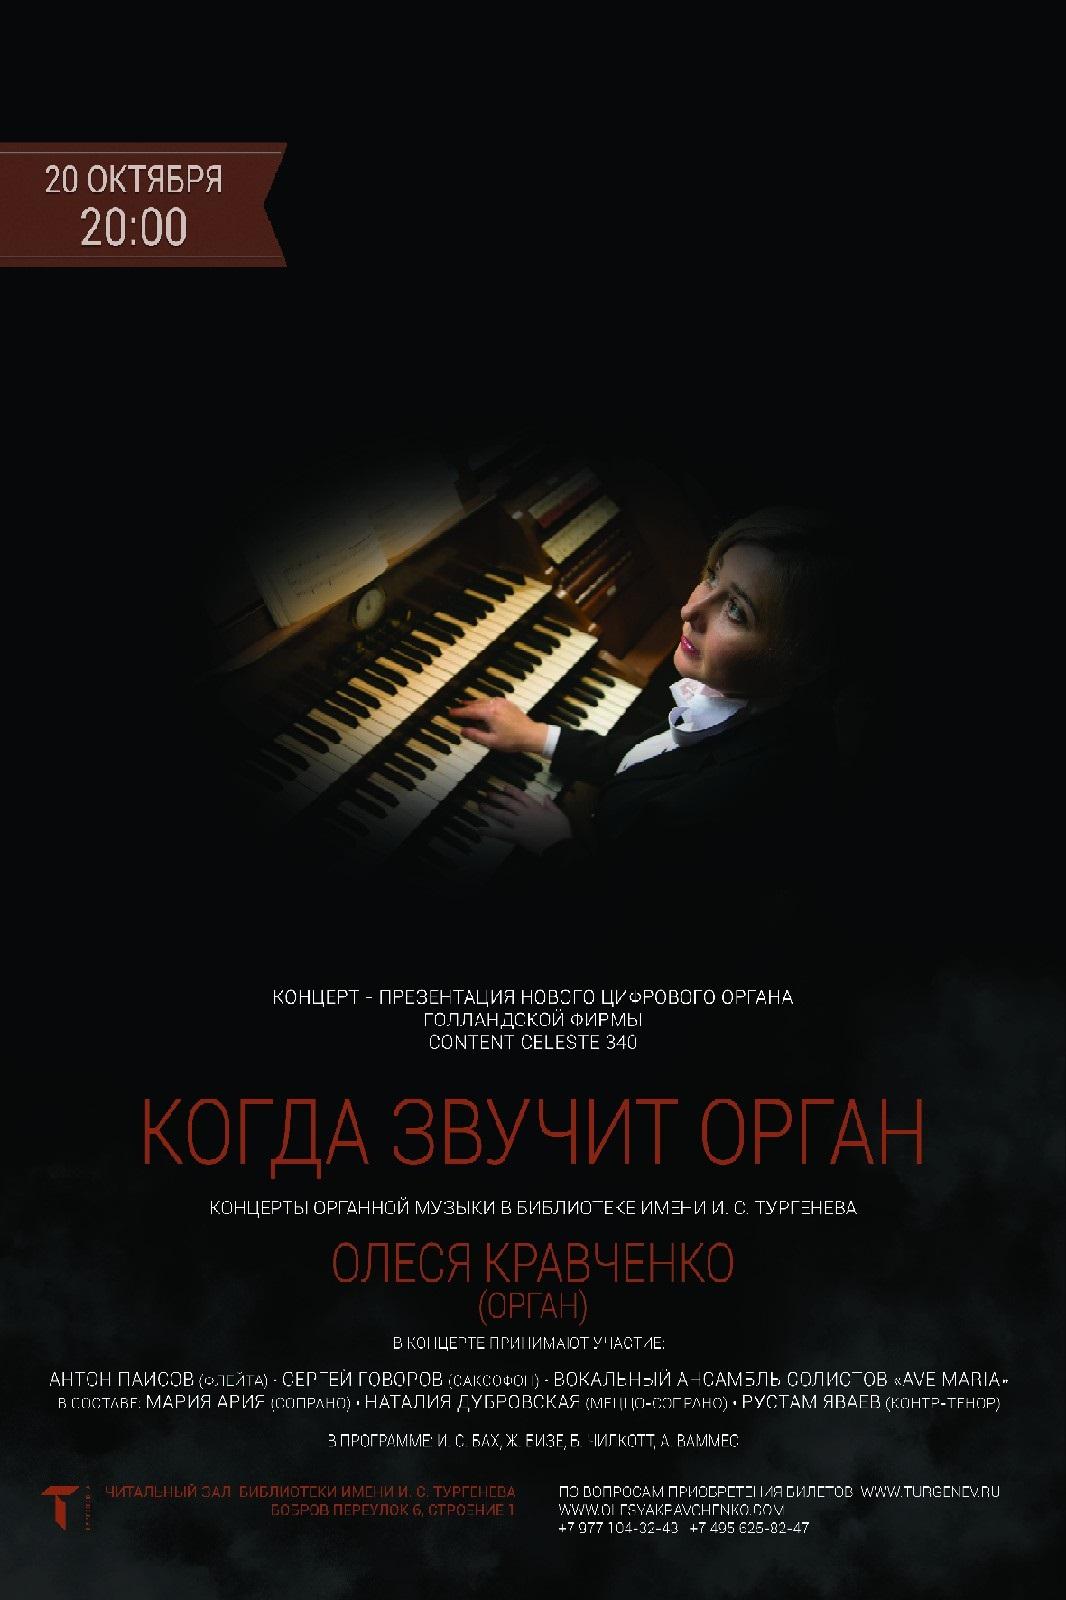 афиша когда звучит орган